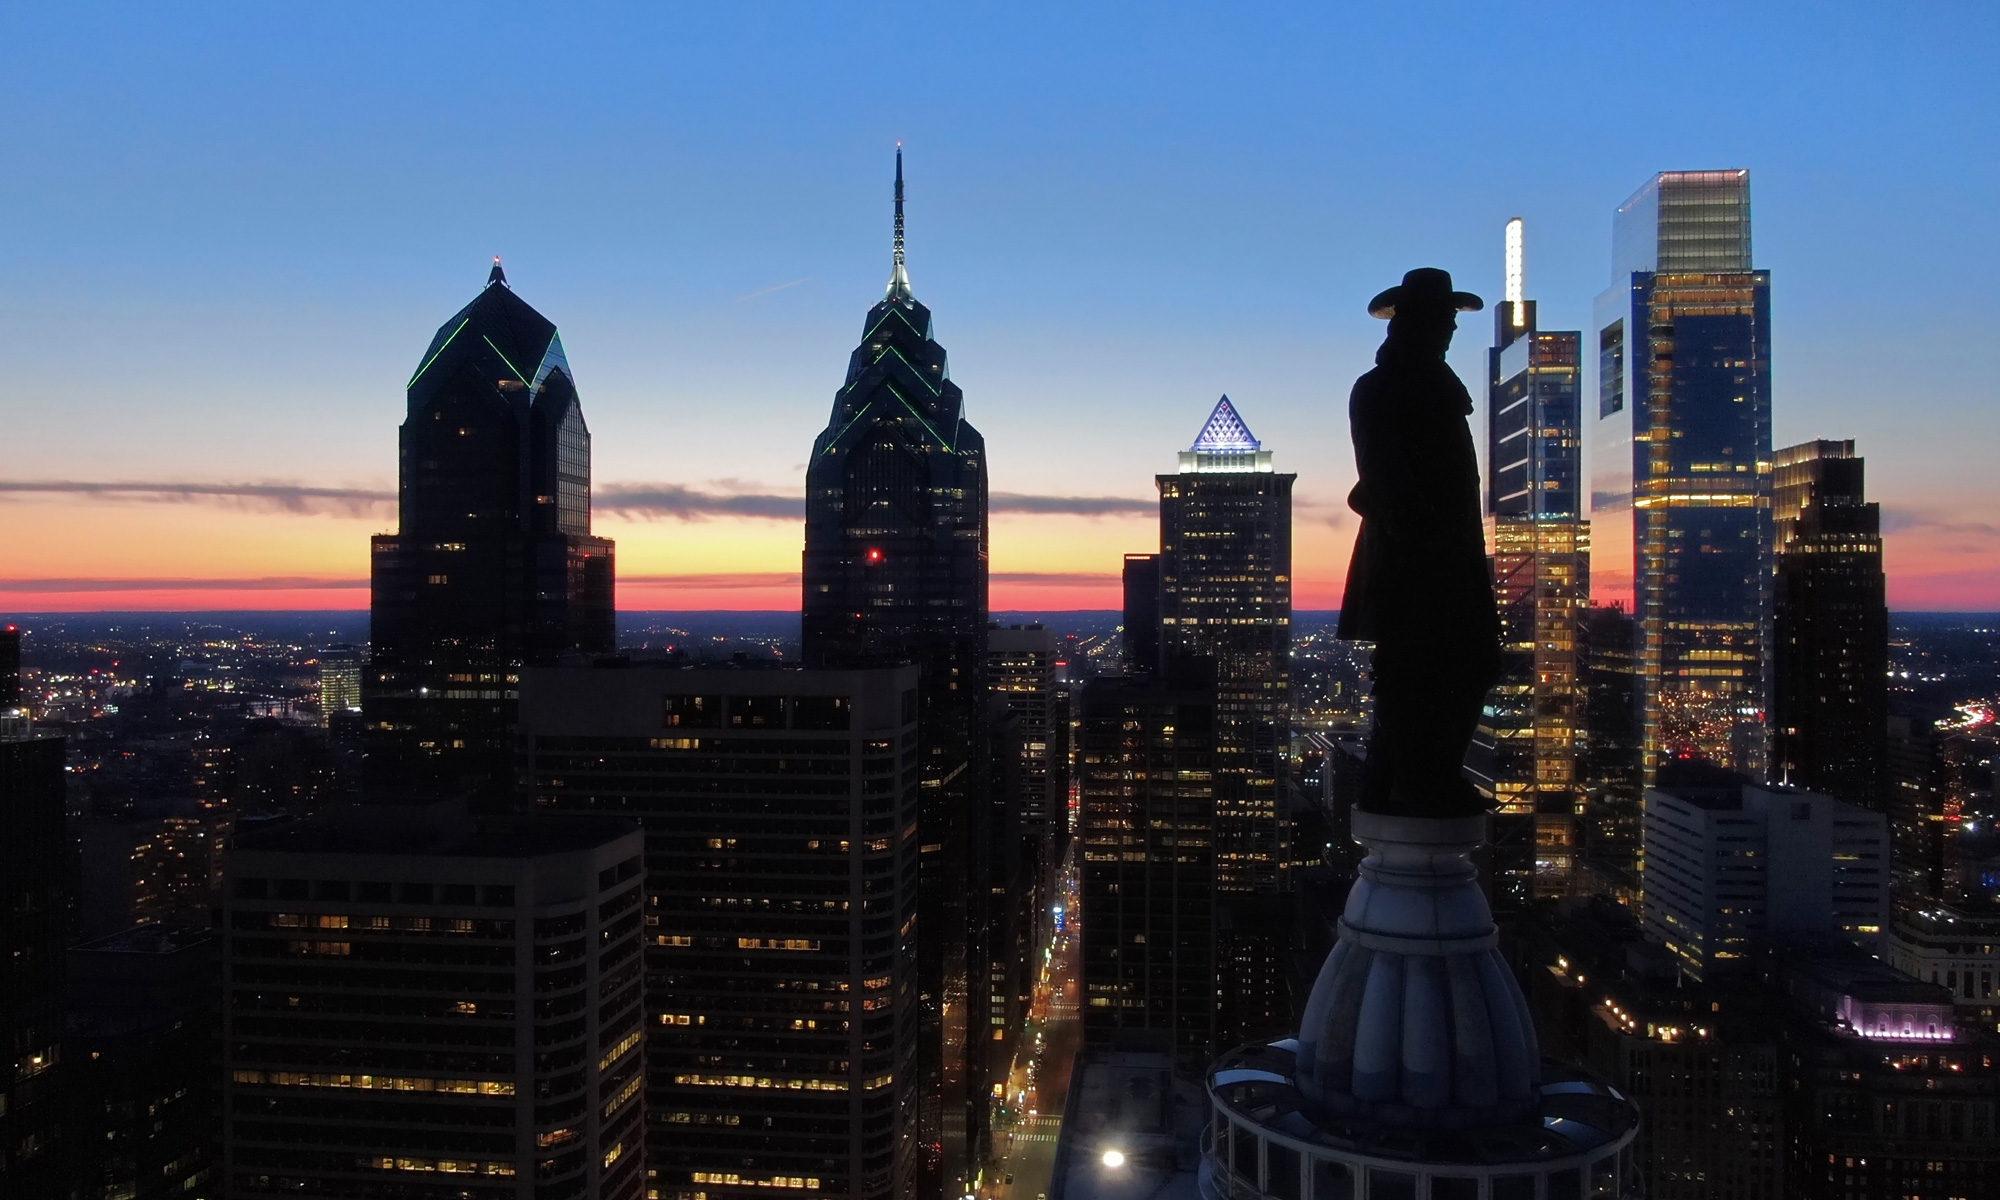 Philadelphia Aerial Photography & Imaging